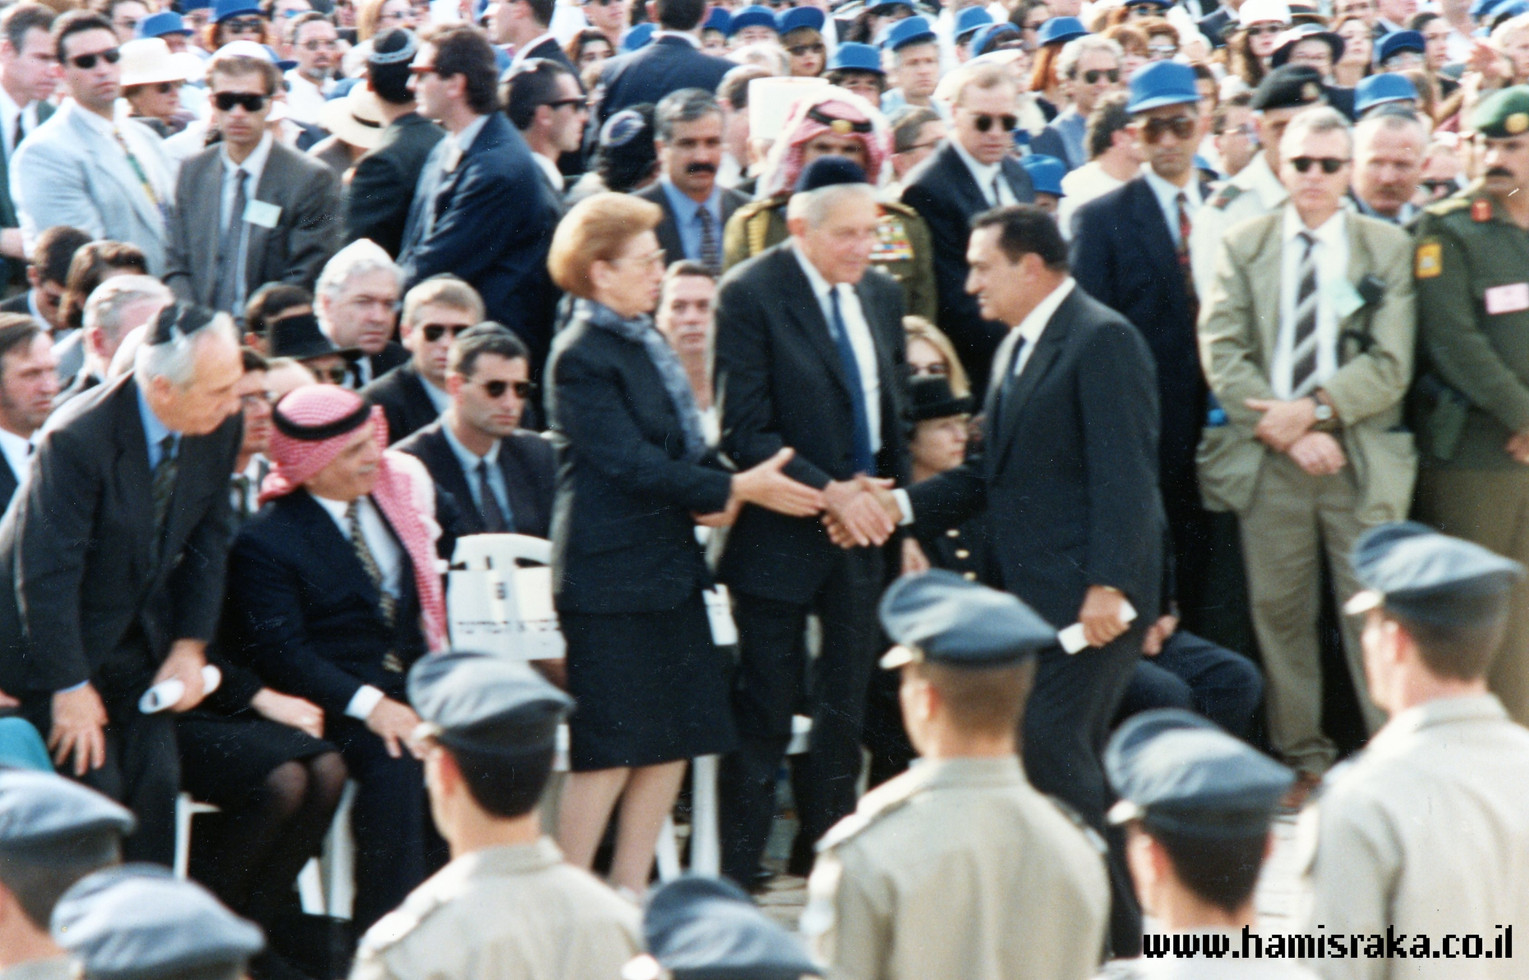 Pnina-Bor-Rabin-Funeral-7.jpg